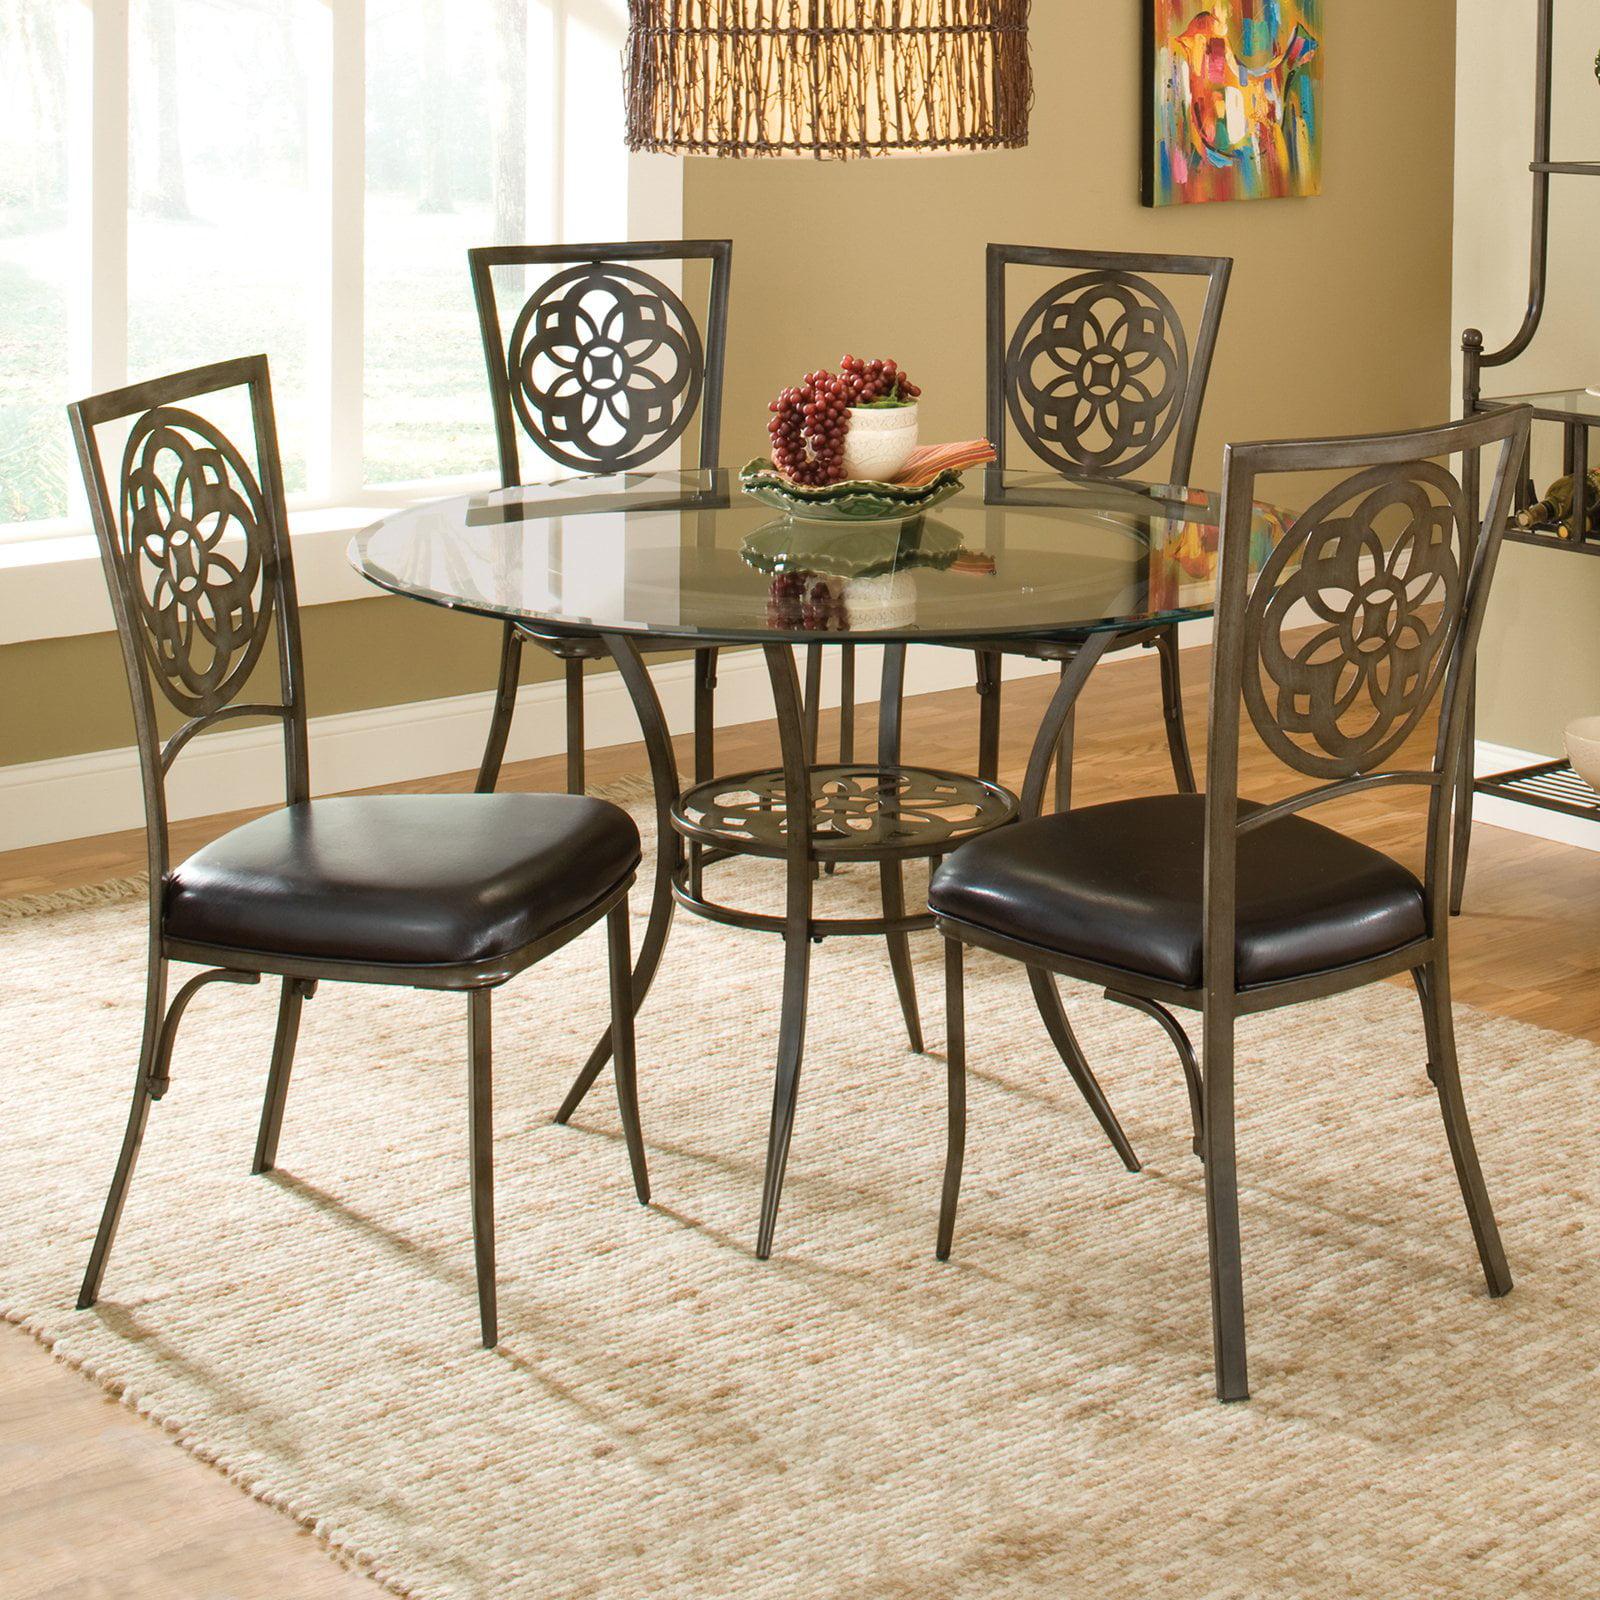 Hillsdale Furniture Bennington 5pc Dining Room Set In: Hillsdale Furniture Marsala 5 PC Dining Set